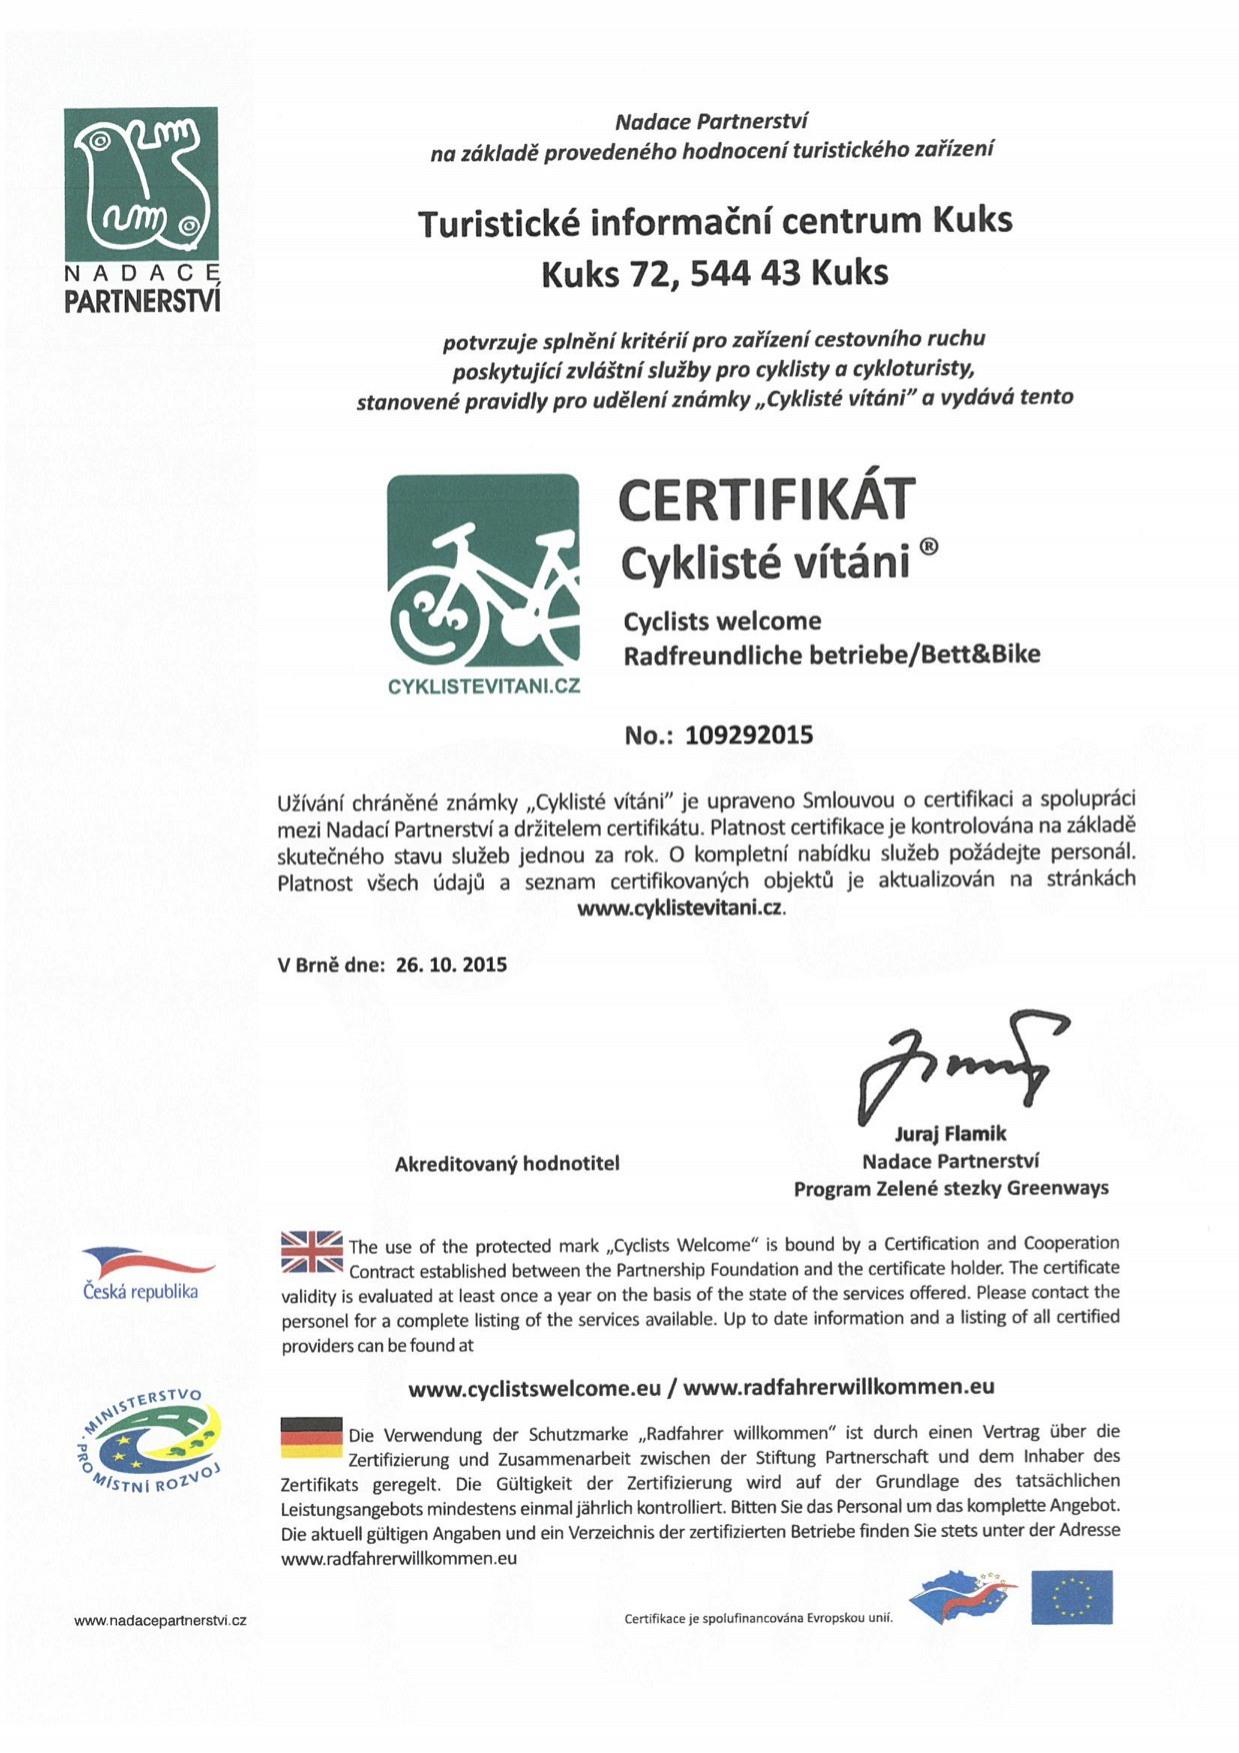 Certifikat Cyskliste vitani